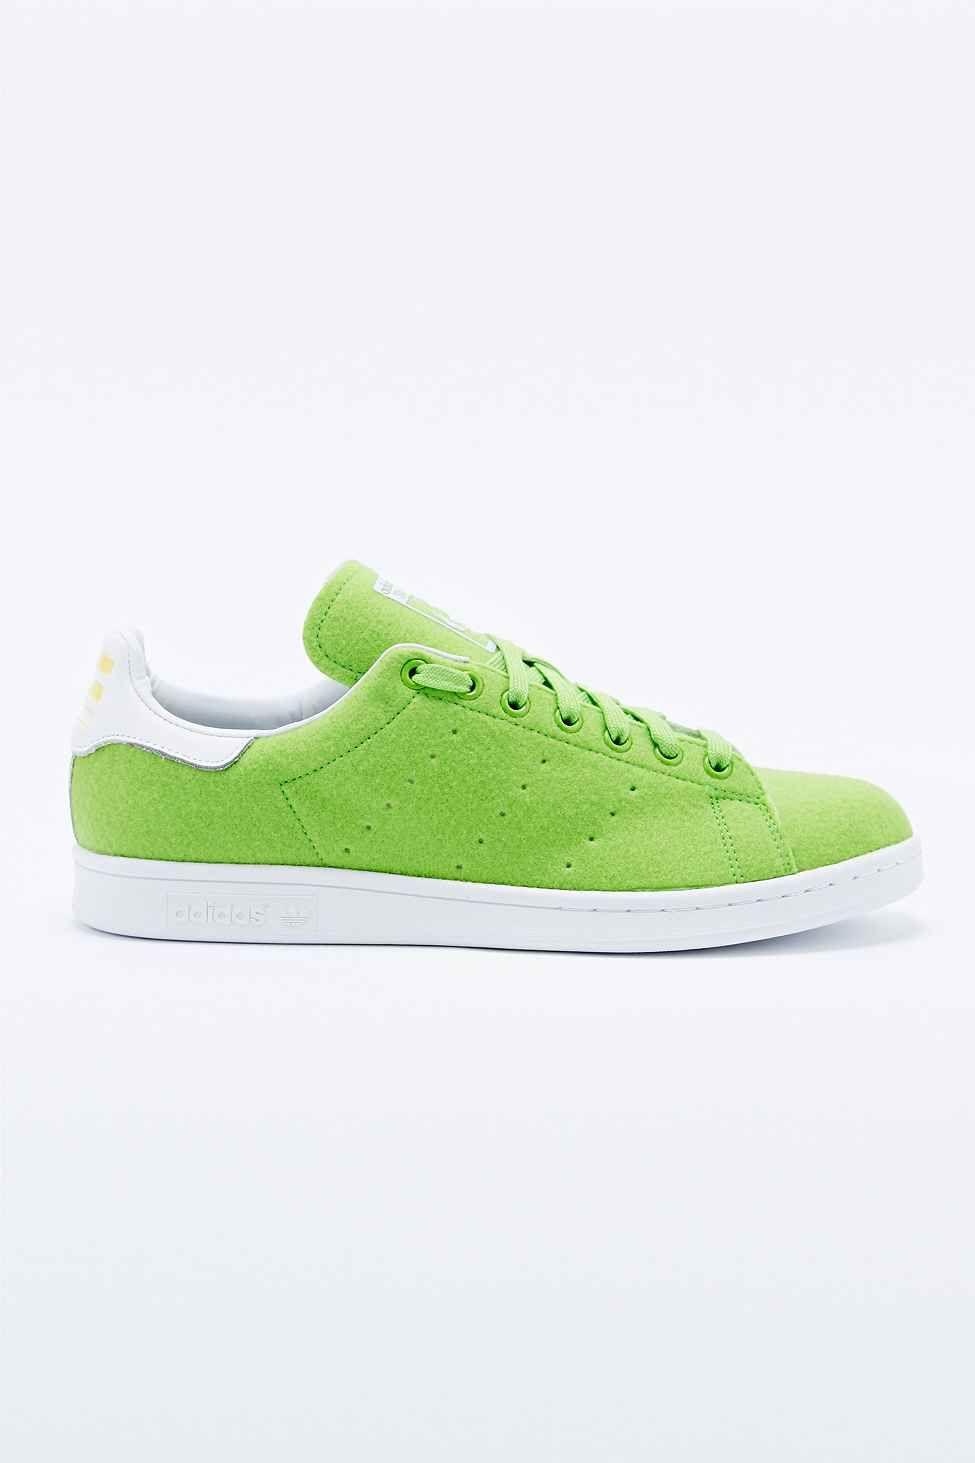 762367782f994 Adidas Originals x Pharrell Williams Stan Smith Trainers in Green ...